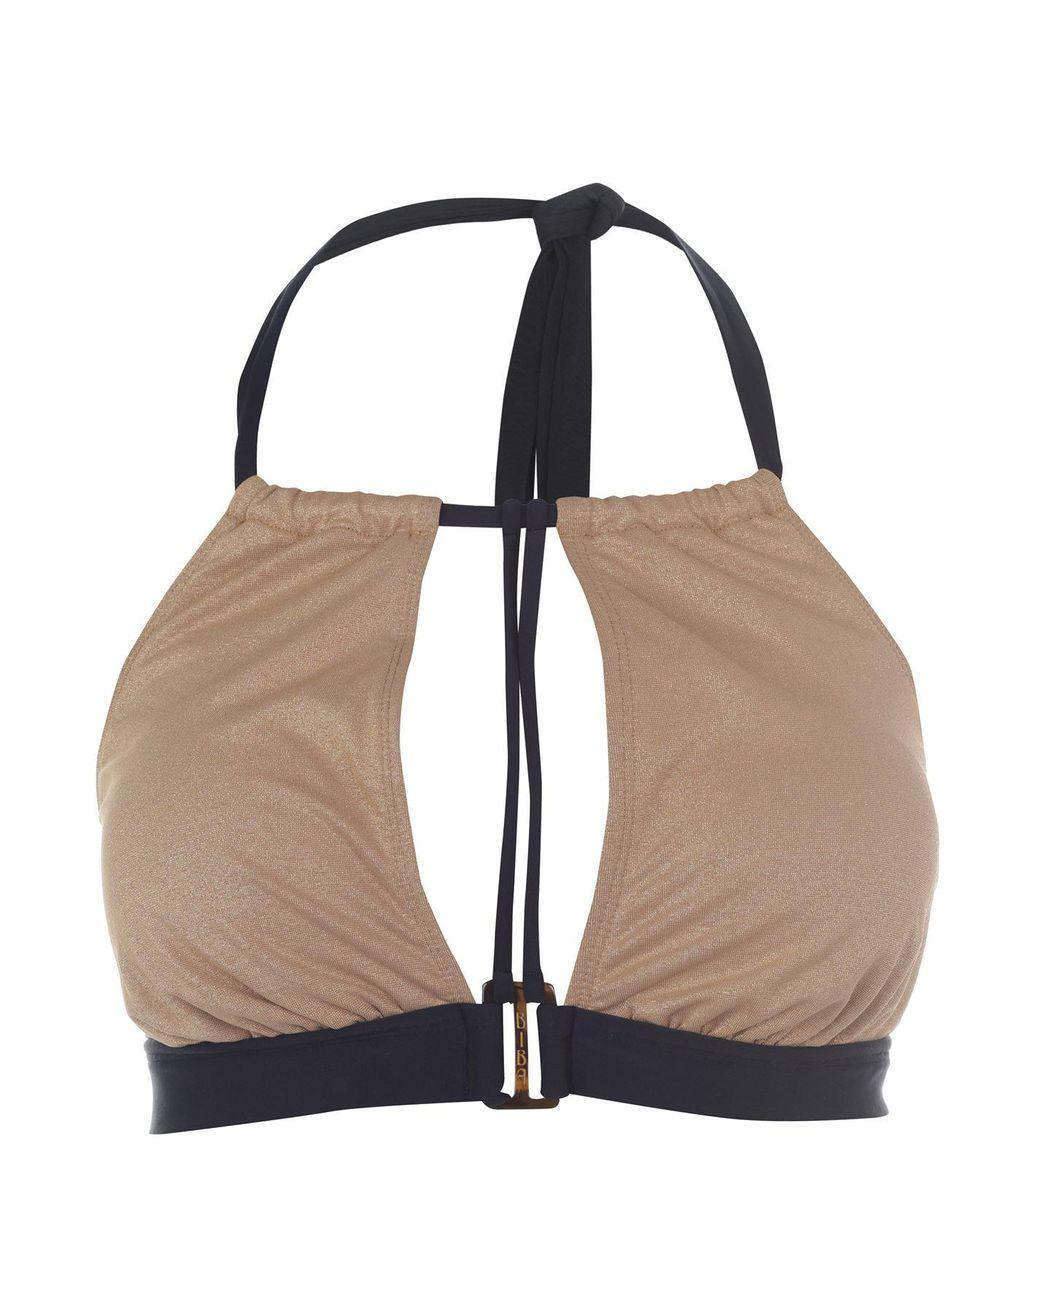 Biba Womens Naomi Metallised Briefs Bikini Elasticated Waist